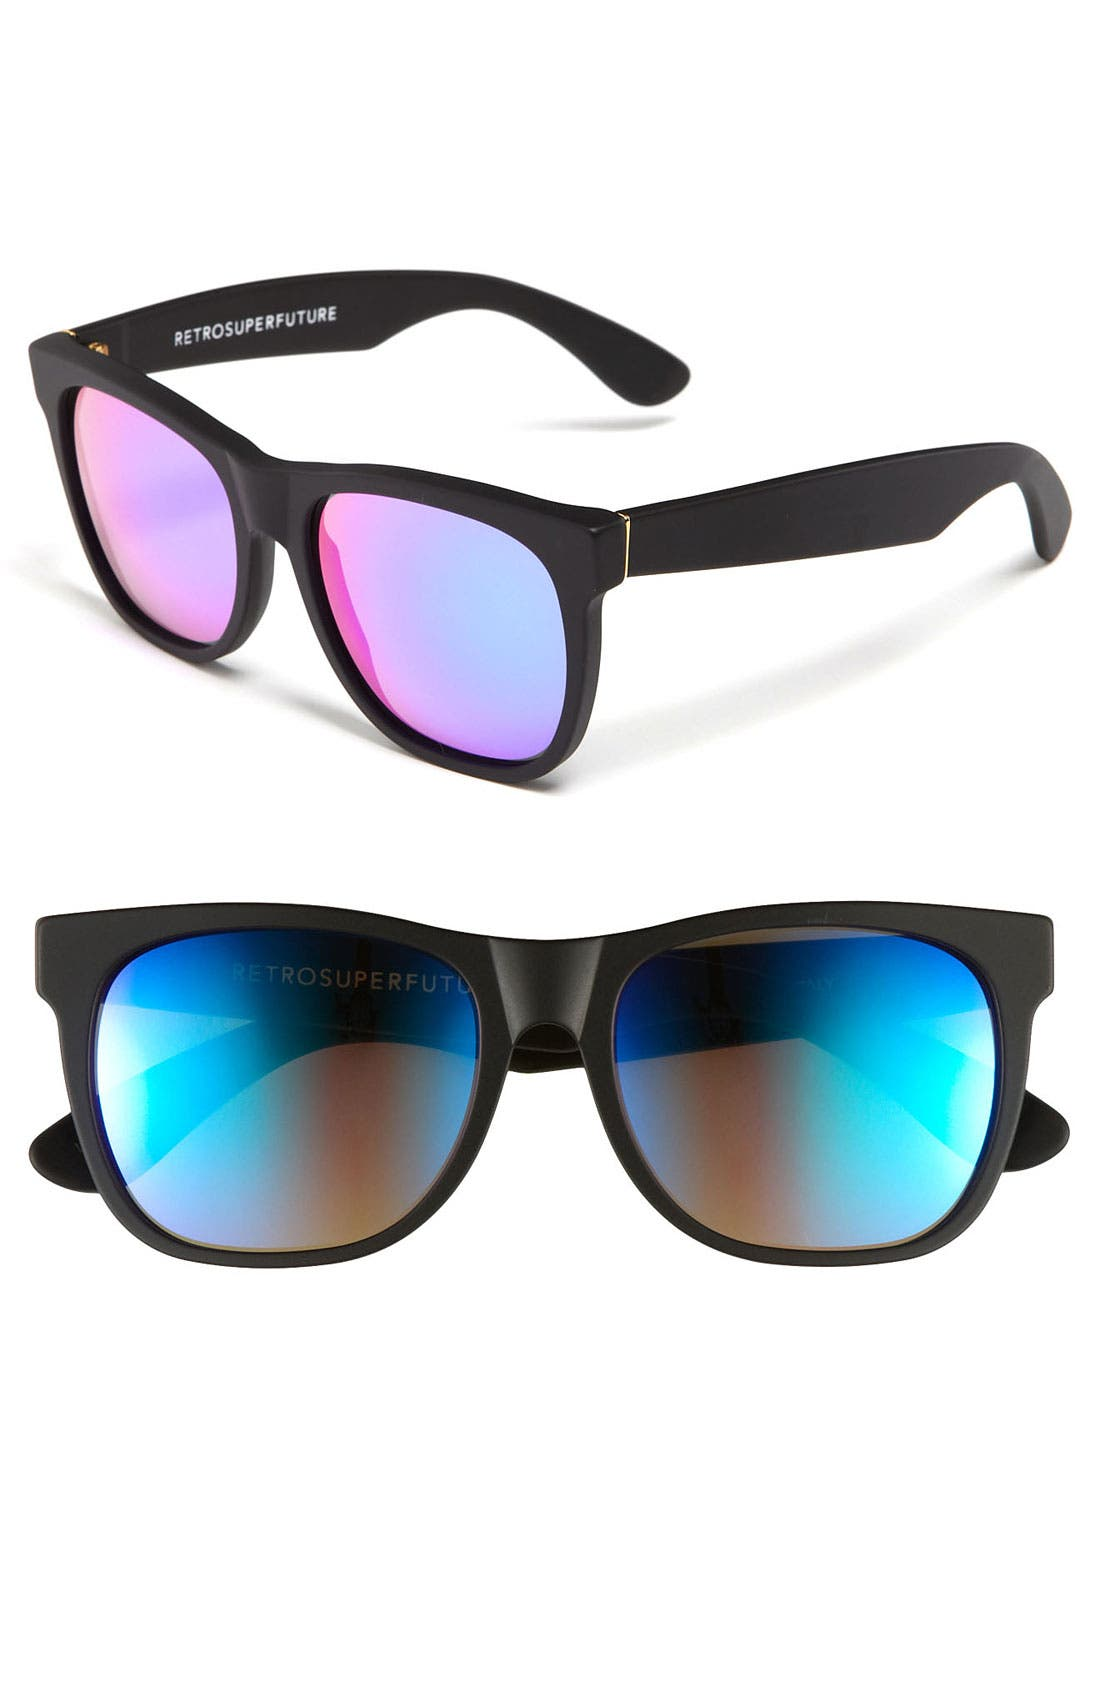 Alternate Image 1 Selected - SUPER by RETROSUPERFUTURE® 'Basic' 55mm Sunglasses